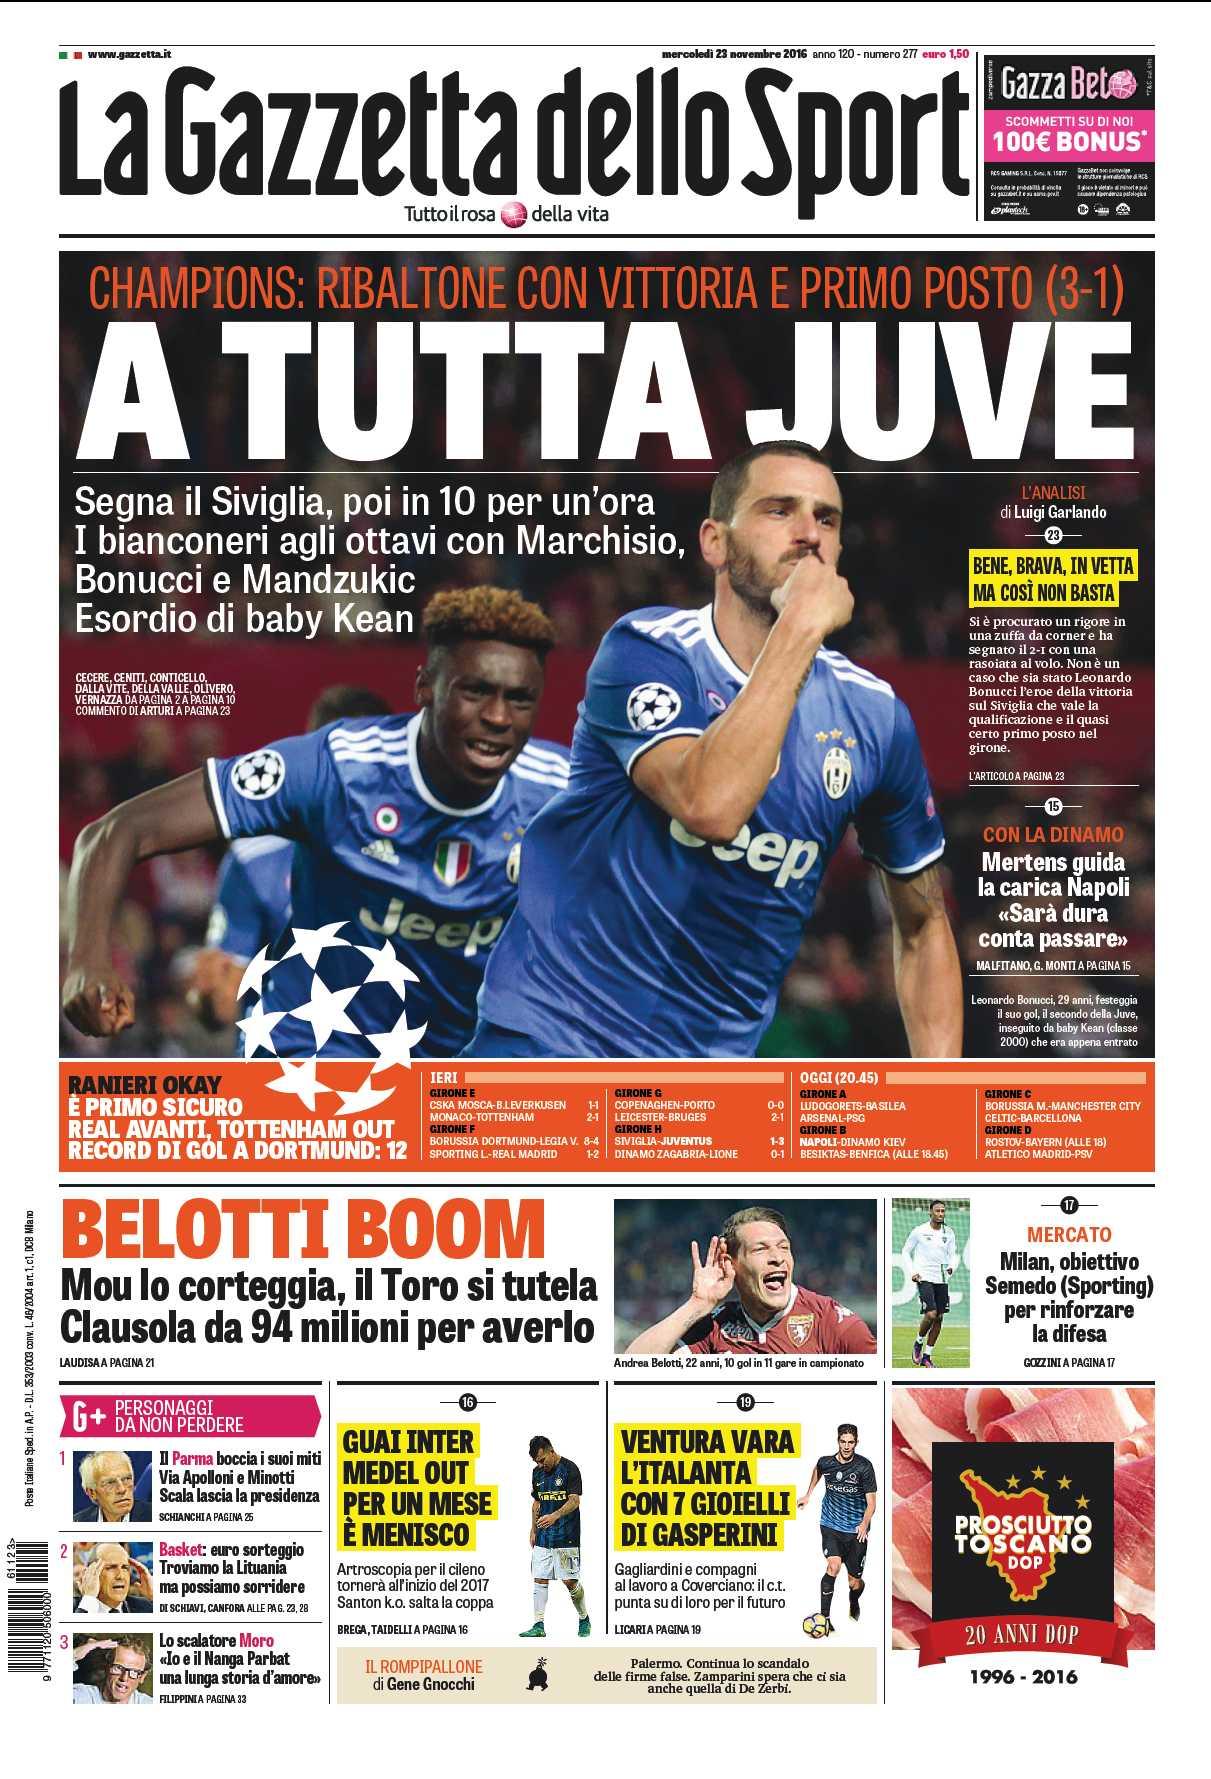 Sulla #Gazzetta in edicola oggi ⚽ A tutta Juve, bianconeri agli ottavi #SivigliaJuve ⚽ Inter, Medel si ferma ⚽ Belotti, clausola da capogiro https://t.co/3LqDZ1xLAD